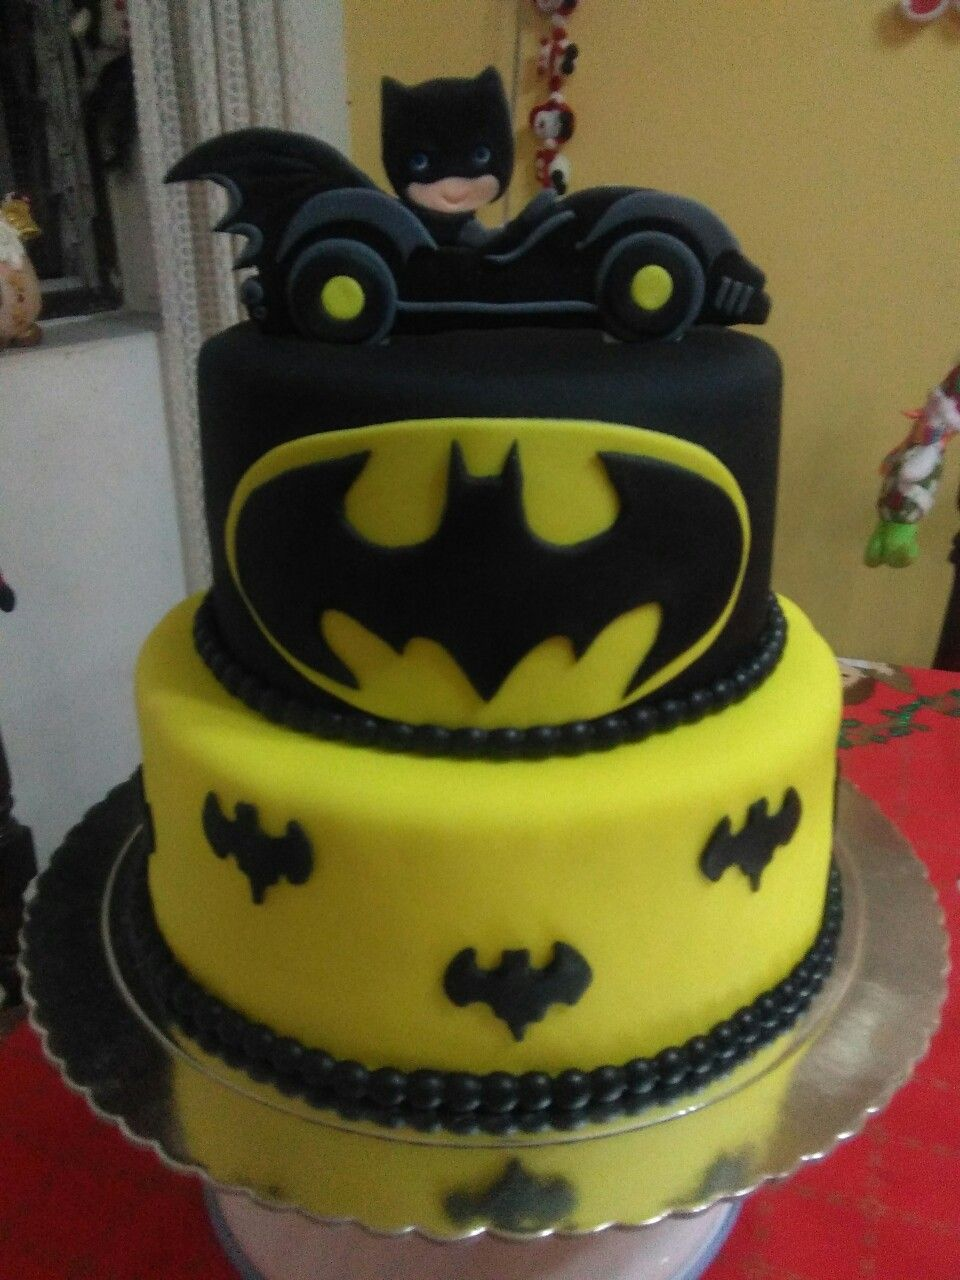 Torta Batman | Tortas en 2019 | Batman, Cake y Desserts